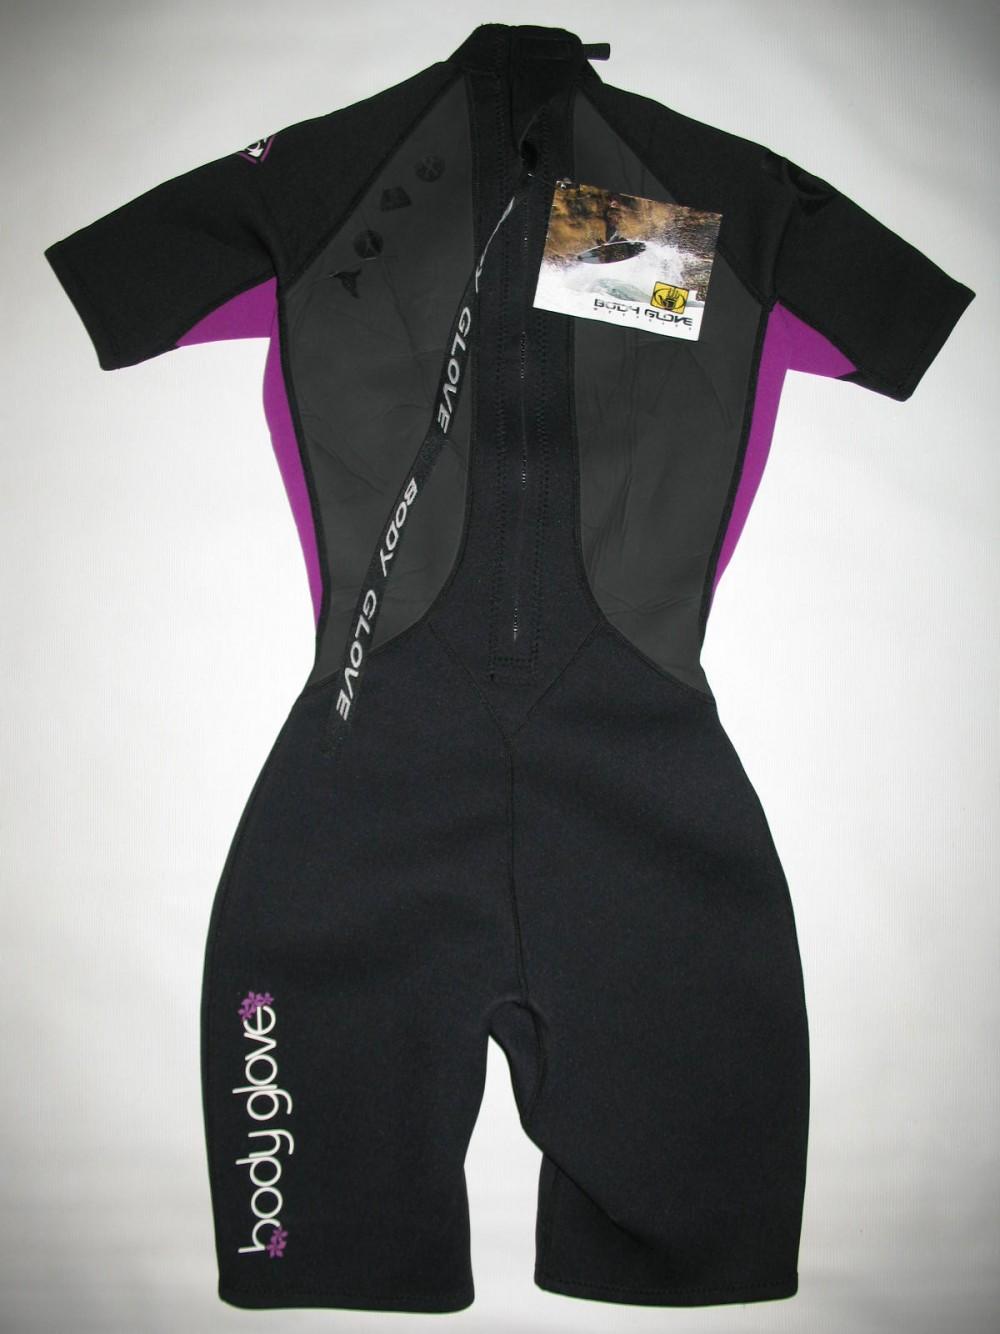 Гидрокостюм BODY GLOVE pro 3 shorty springsuit lady (размер 5/6(рост157-163см/вес50-53кг)) - 2